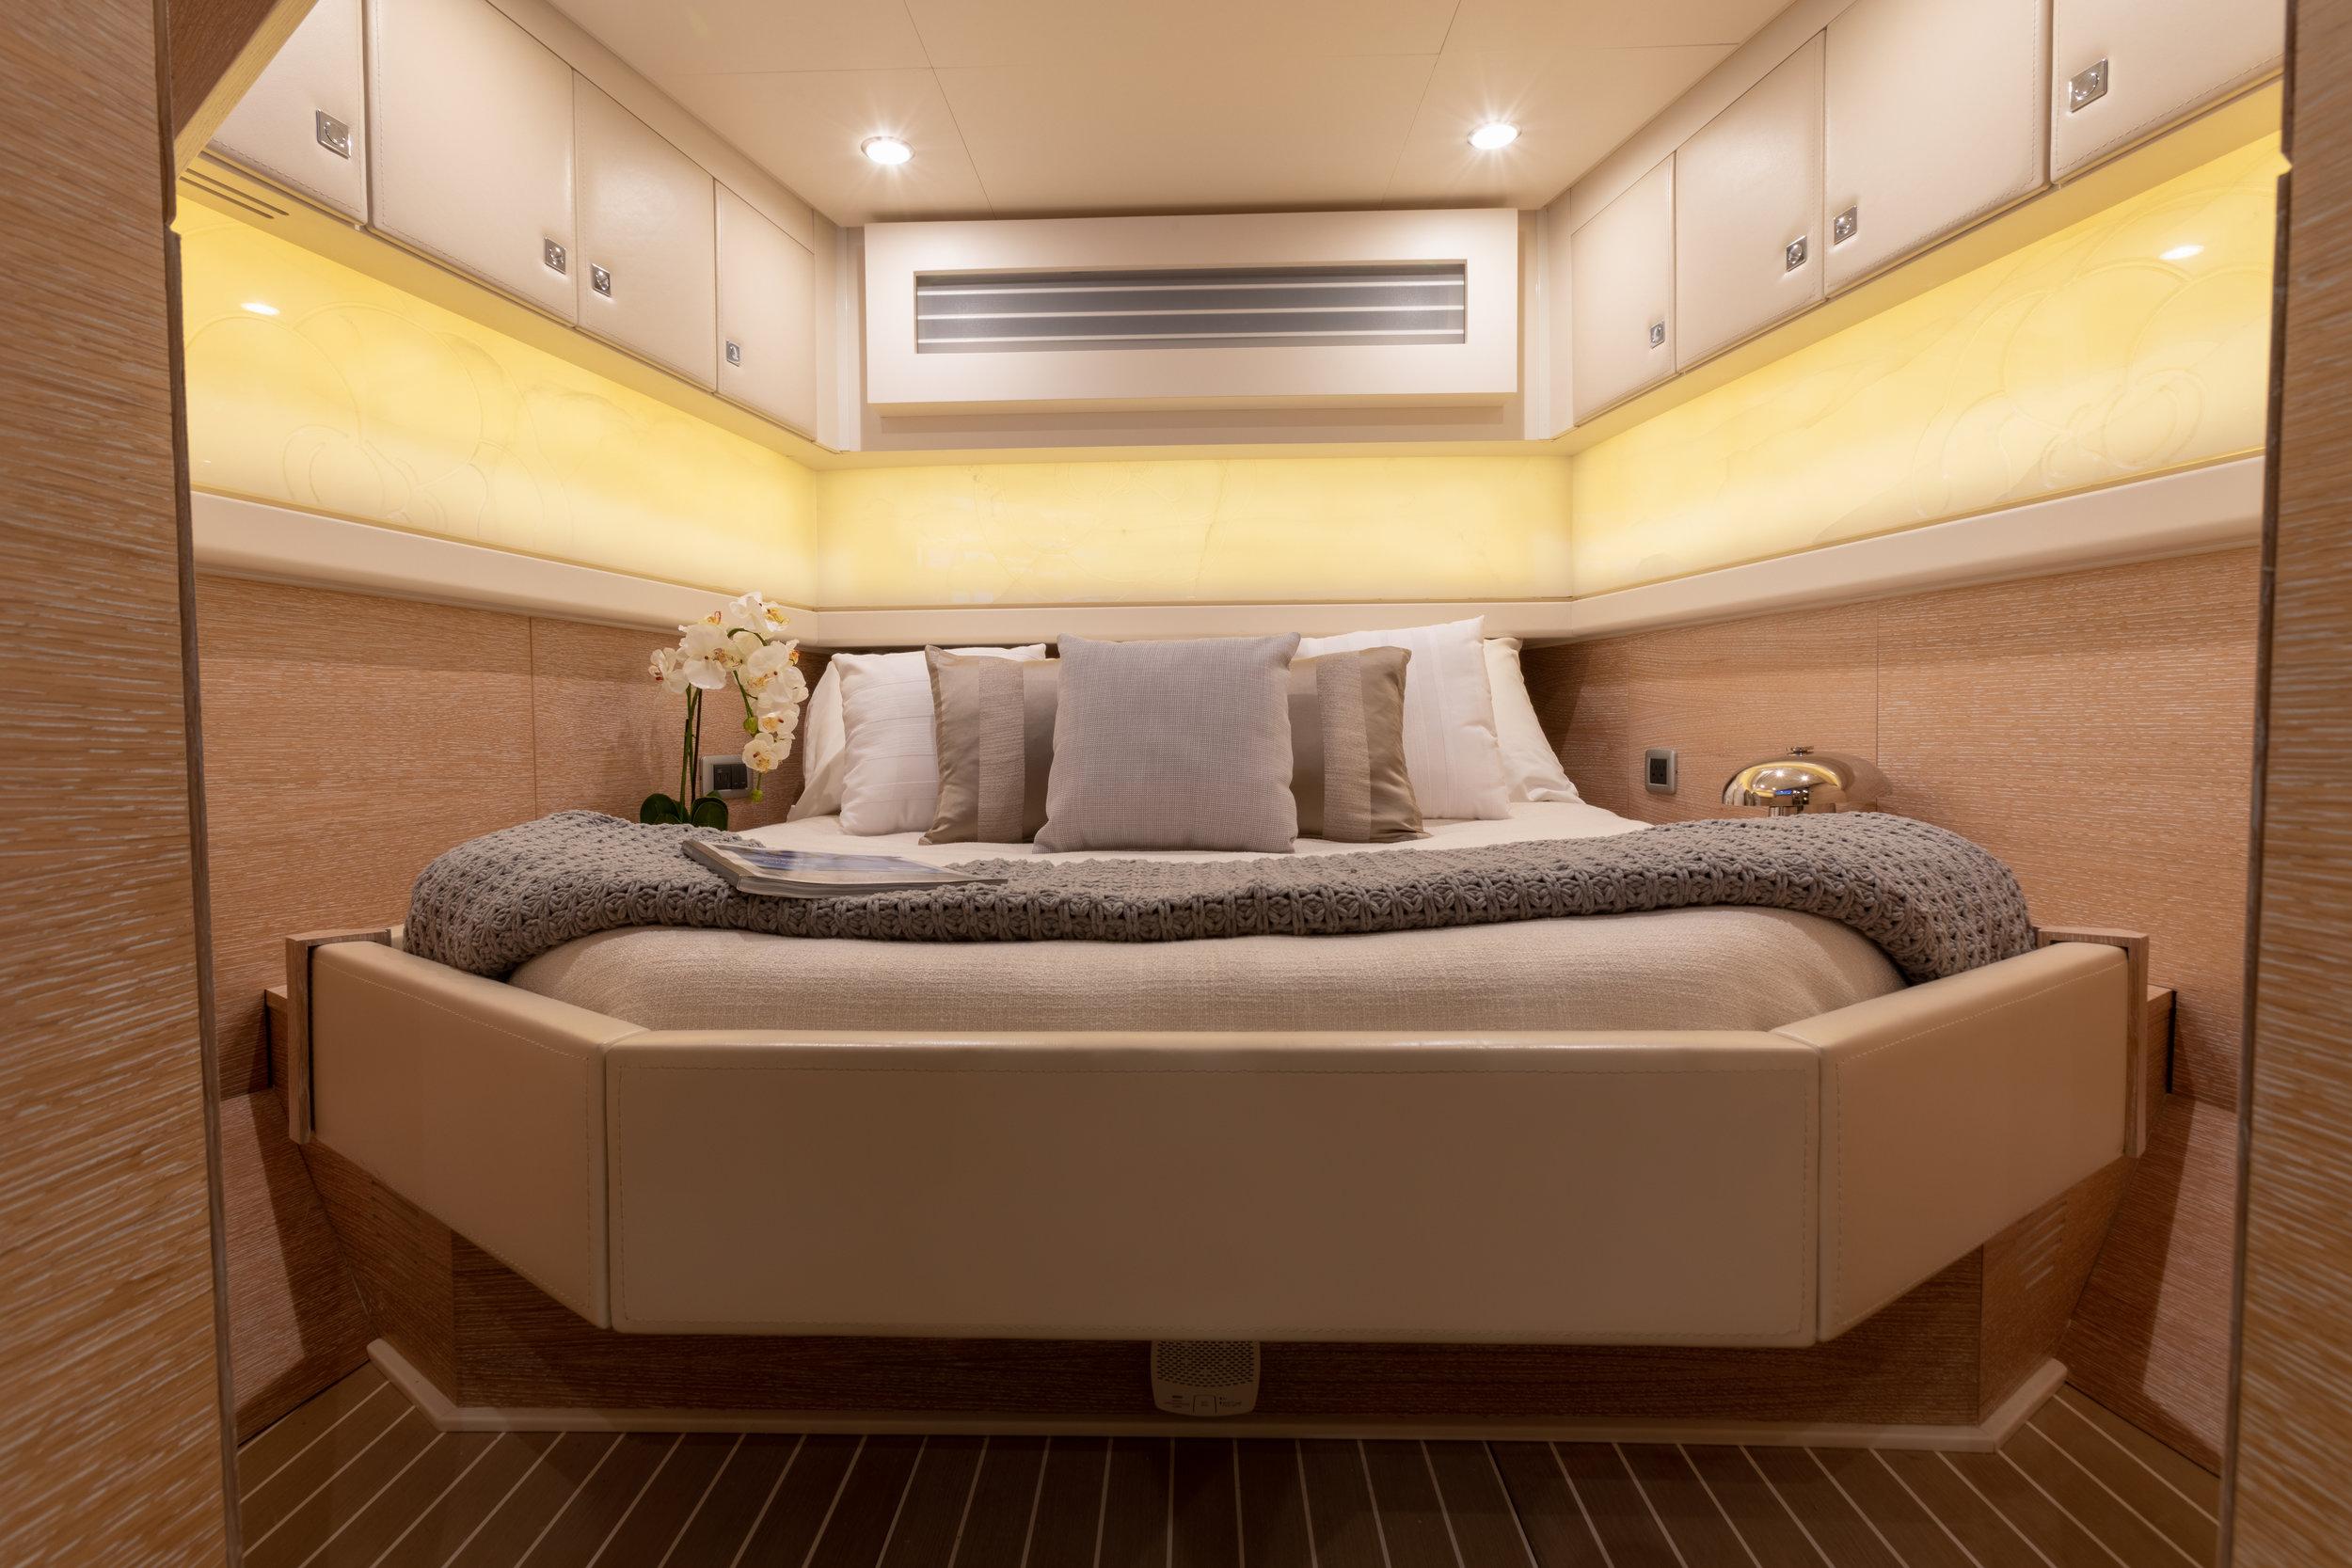 530lxf-interior-1118_DM3A8260-HDR-.jpg